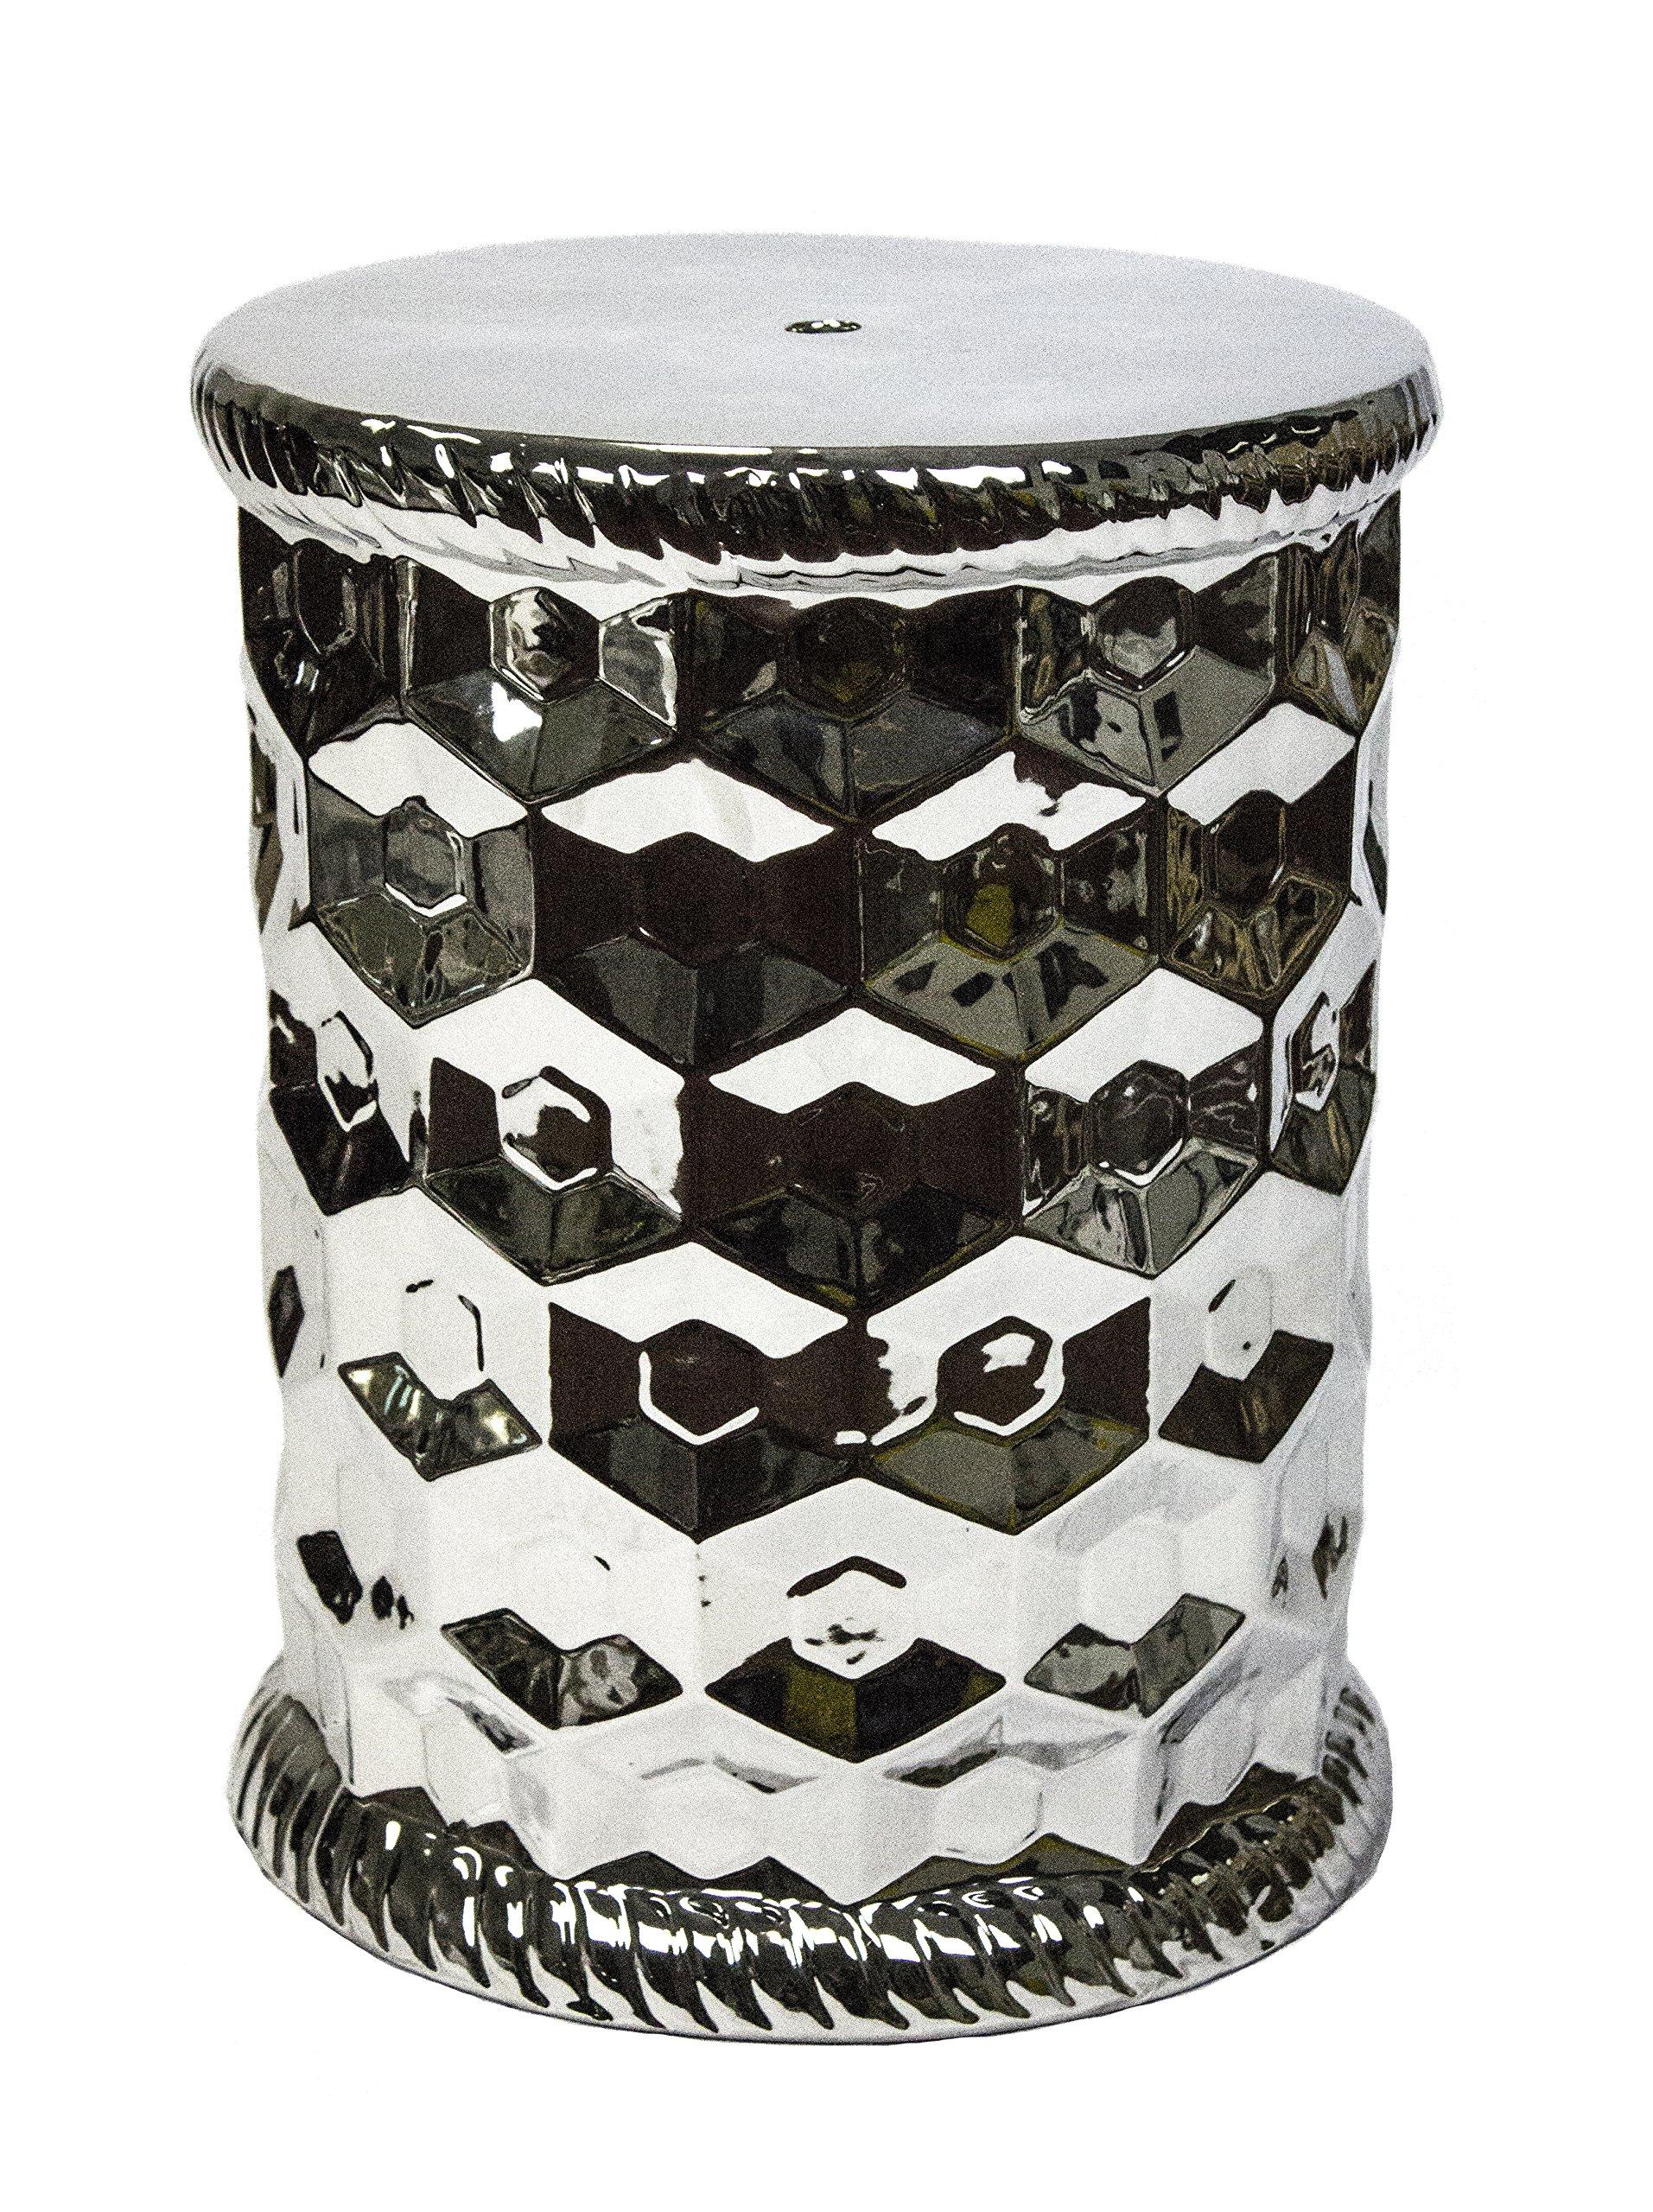 Sagebrook Home FC10453-01 Edged Garden Stool, Silver Ceramic, 13 x 13 x 18 Inches